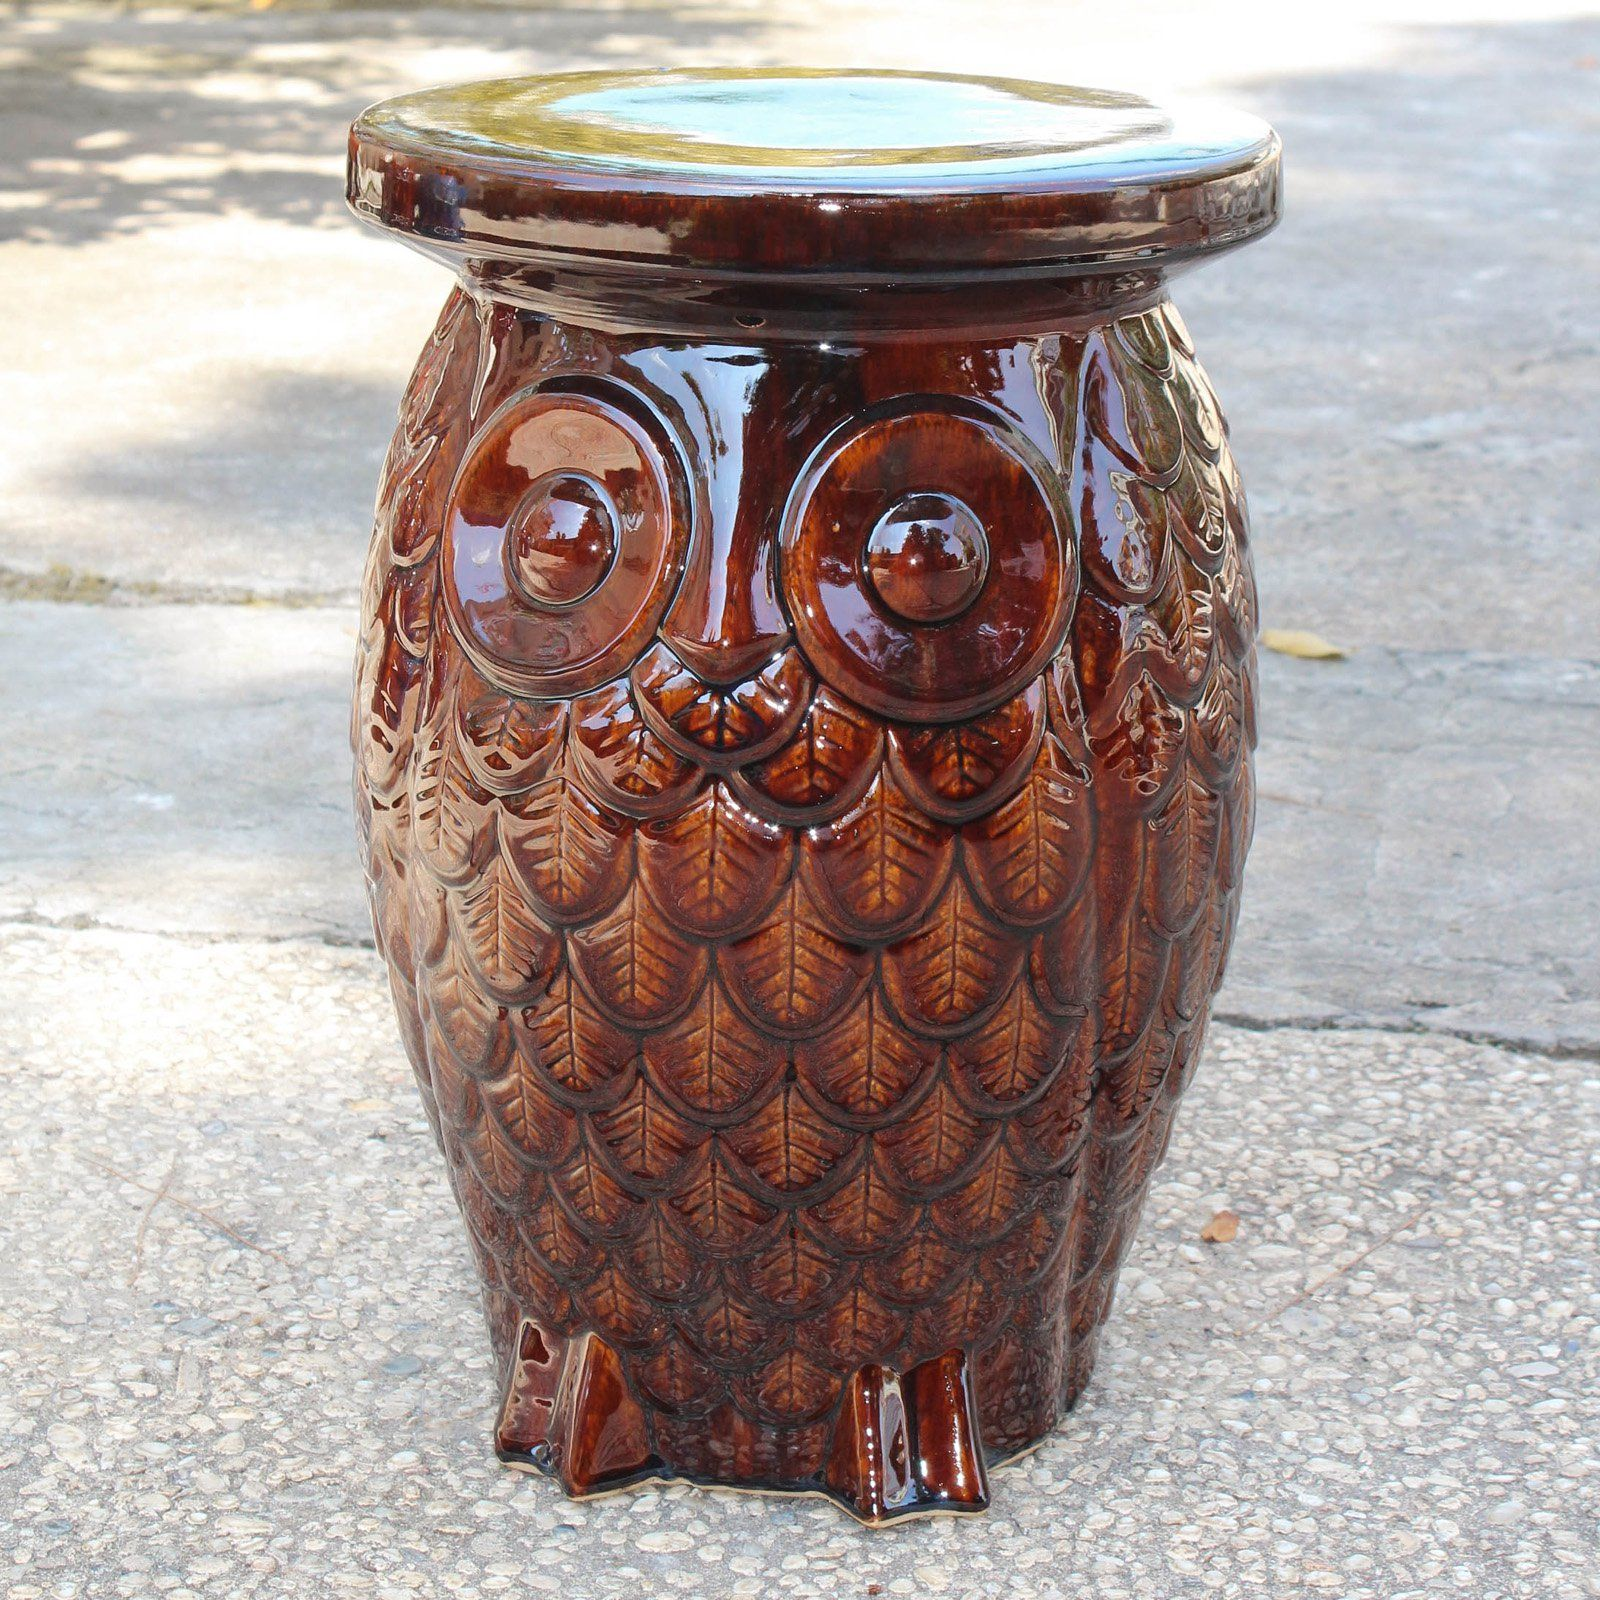 Outdoor International Caravan Catalina Wise Owl Ceramic